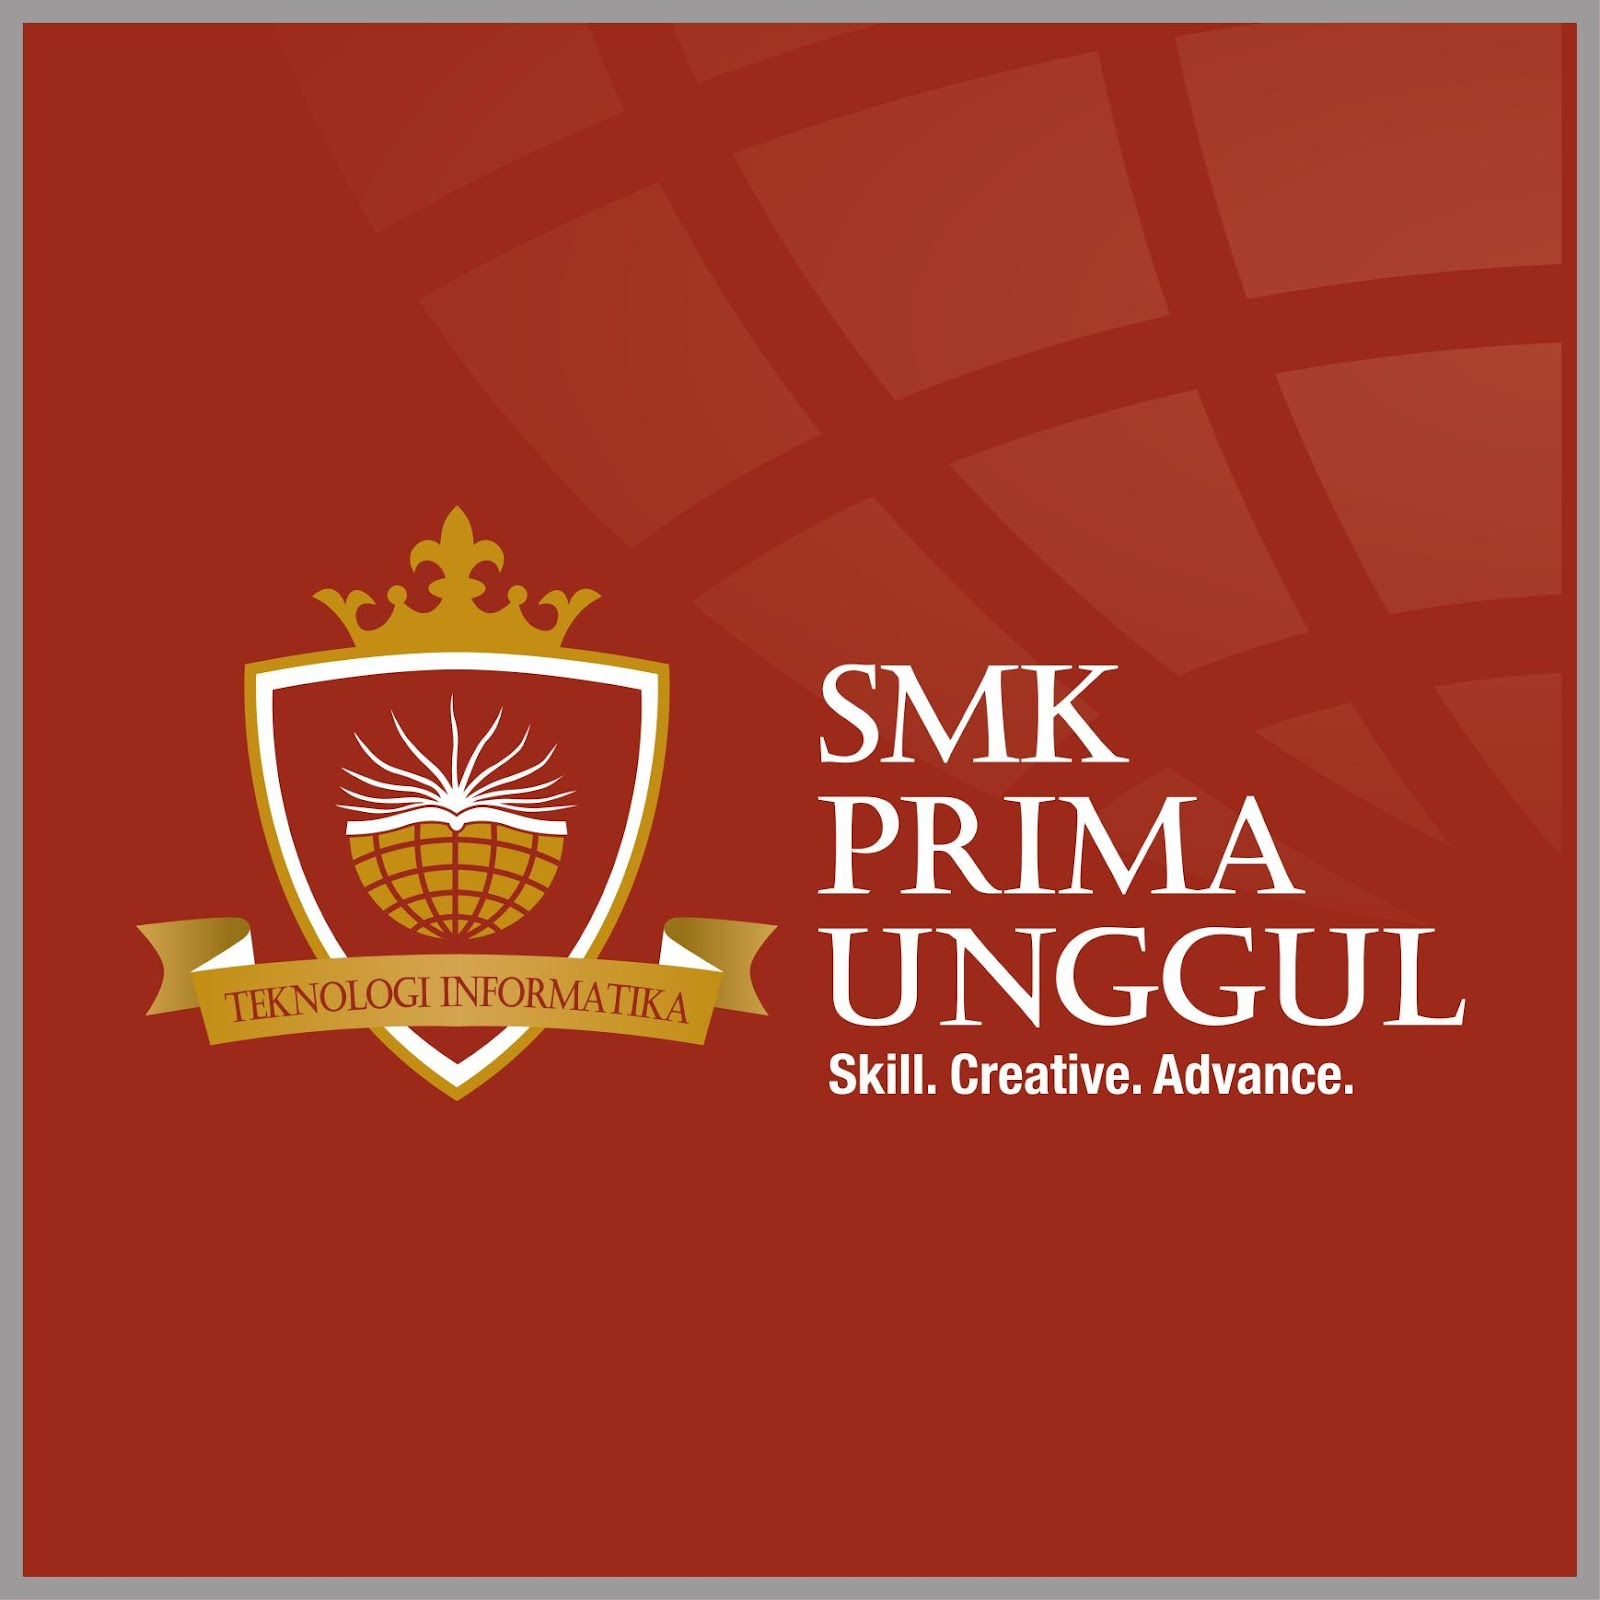 Indonesia anak mahasiswa baru universitas indonesia - 1 2